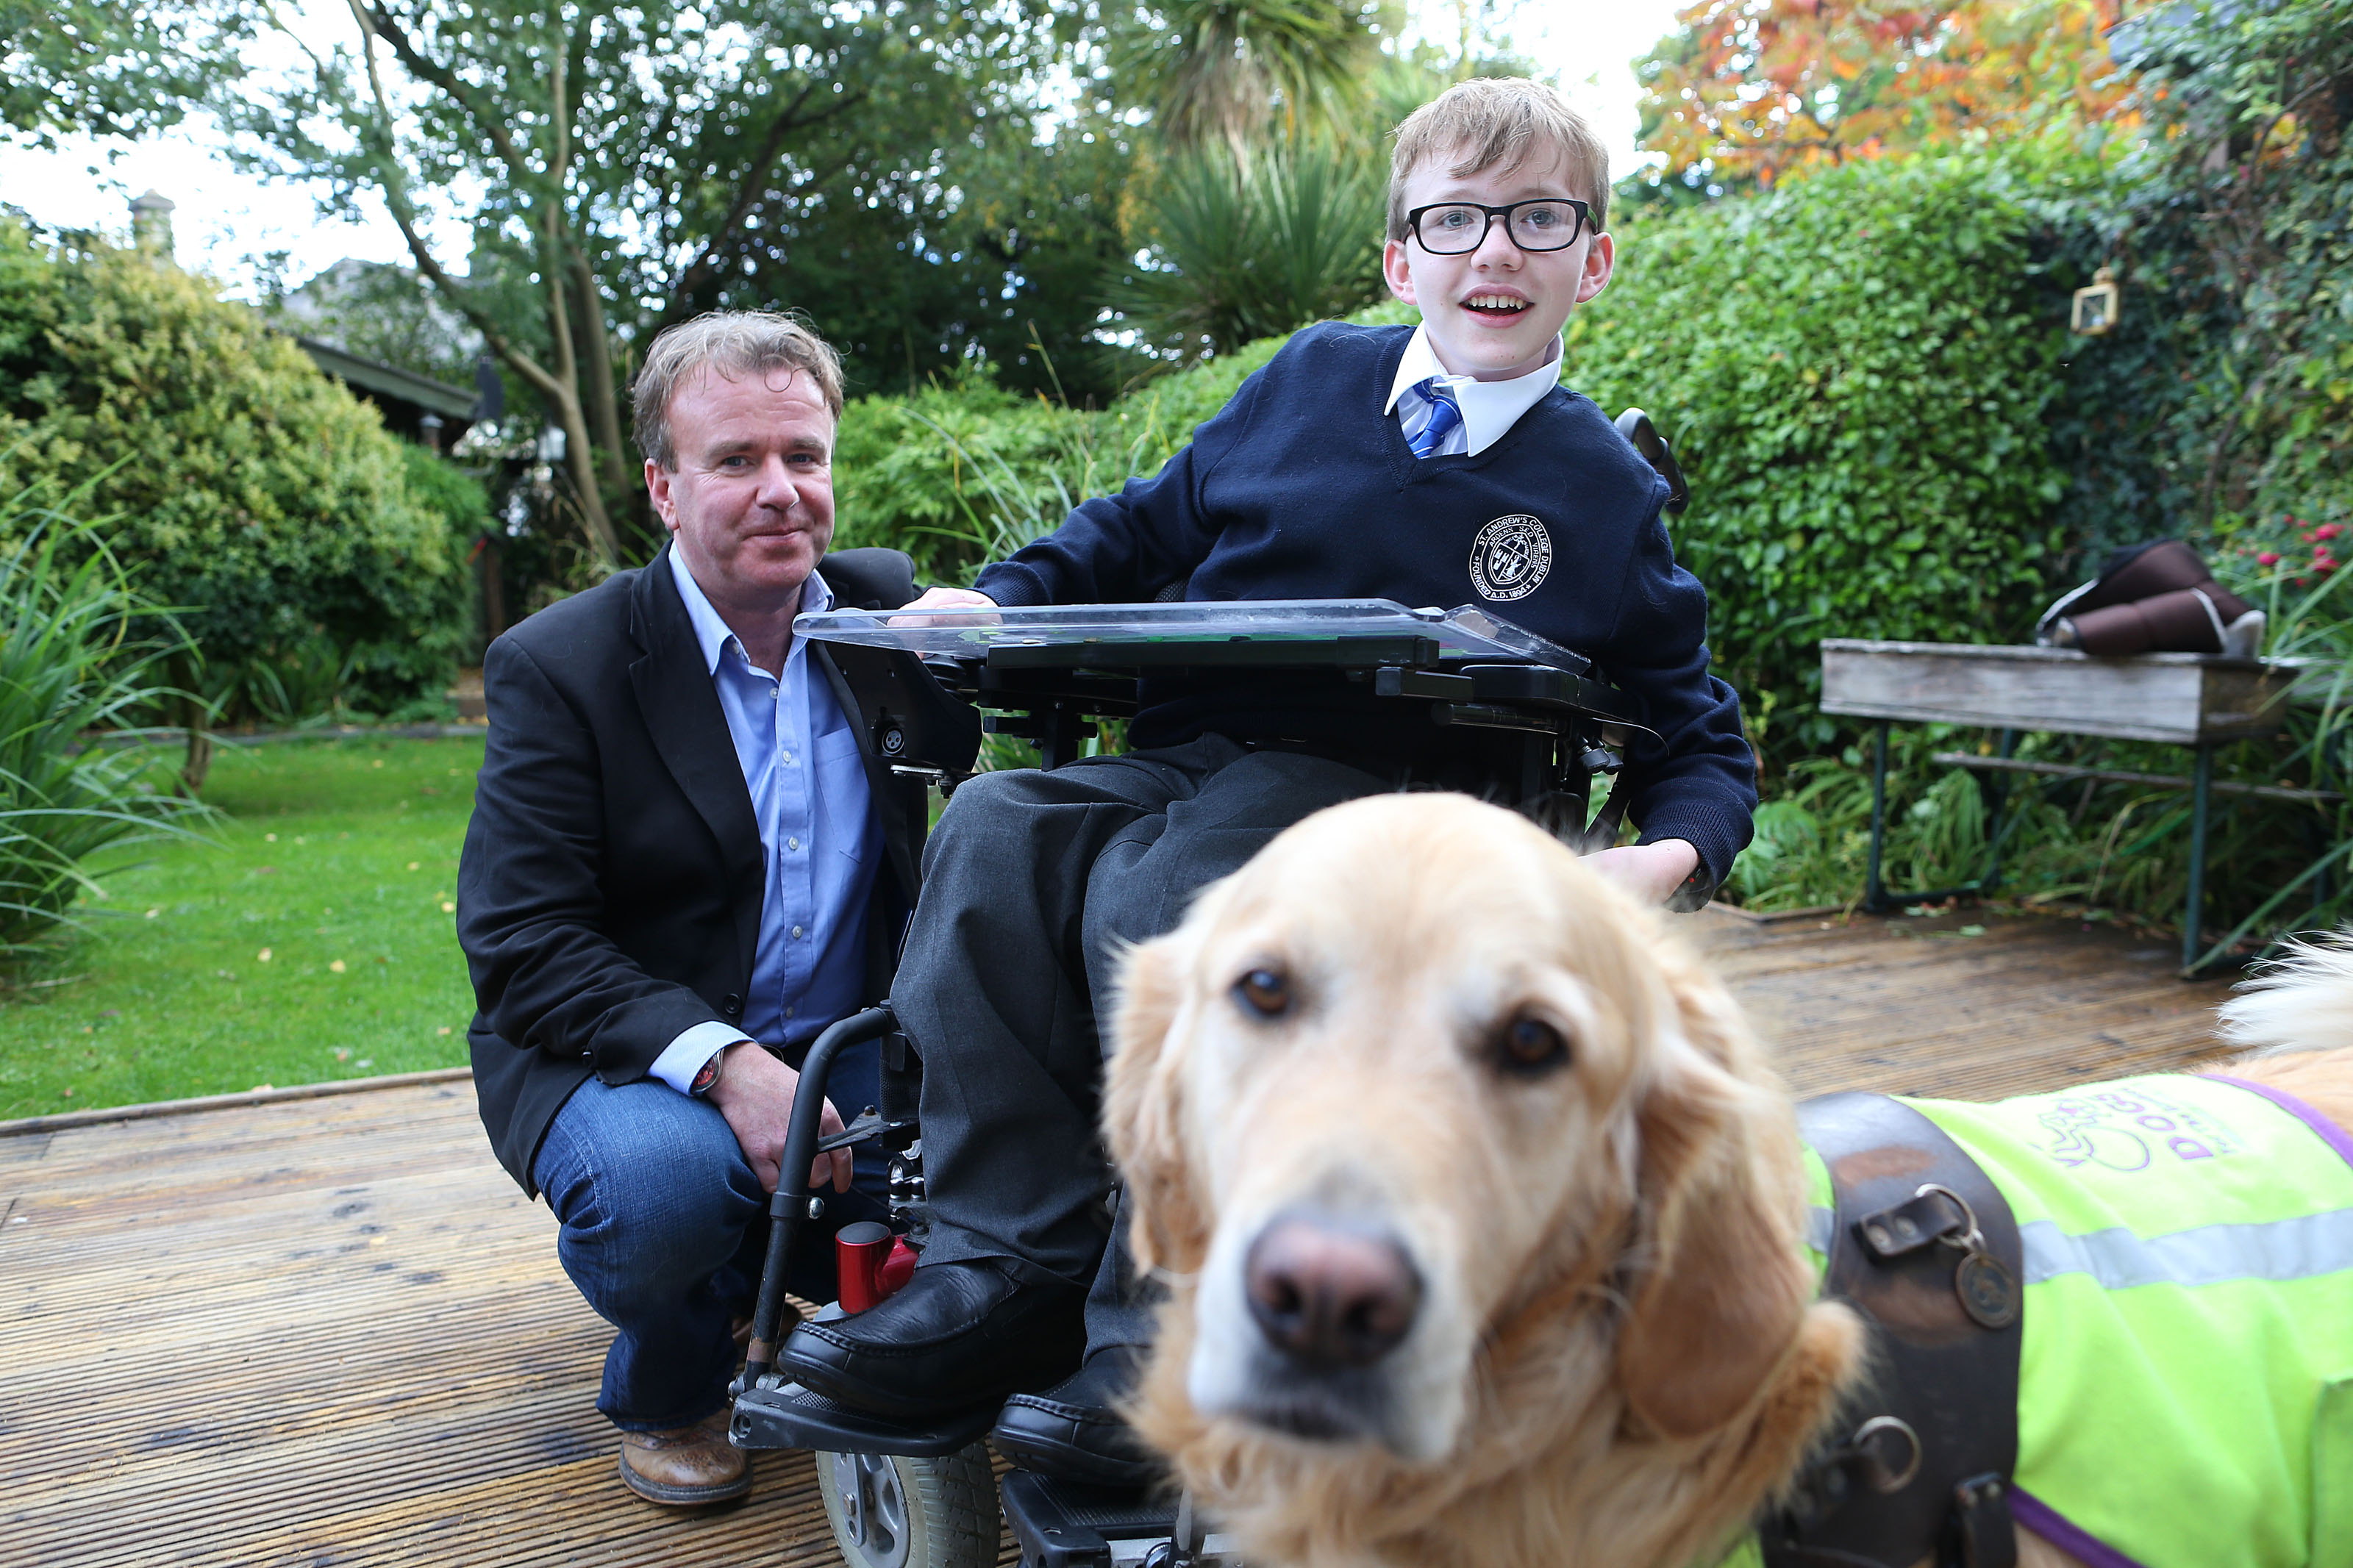 Tom Clonan and Son